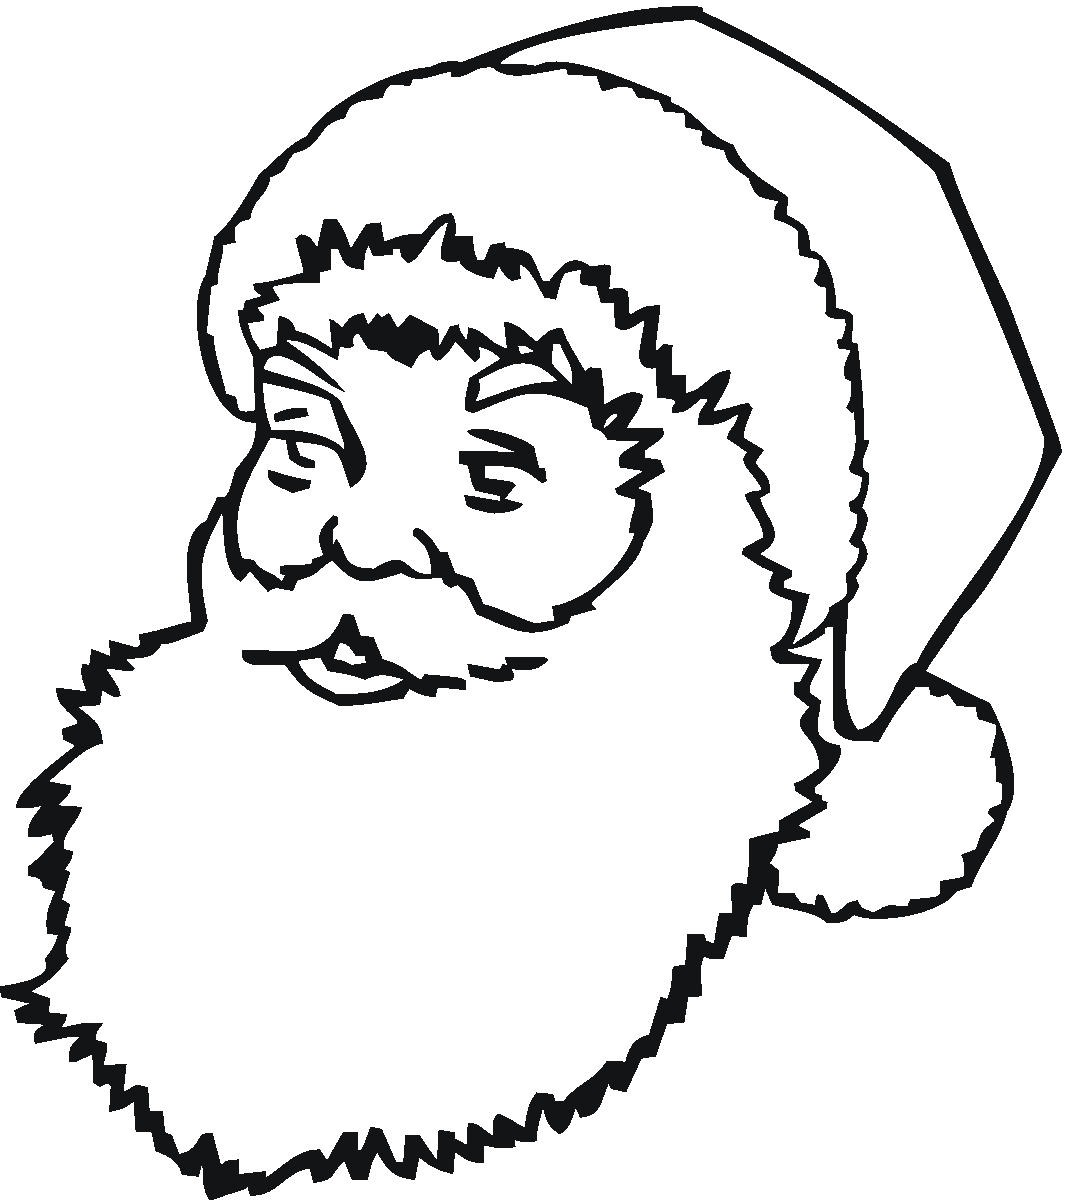 Clip Art Santa Claus Workshop Stencils